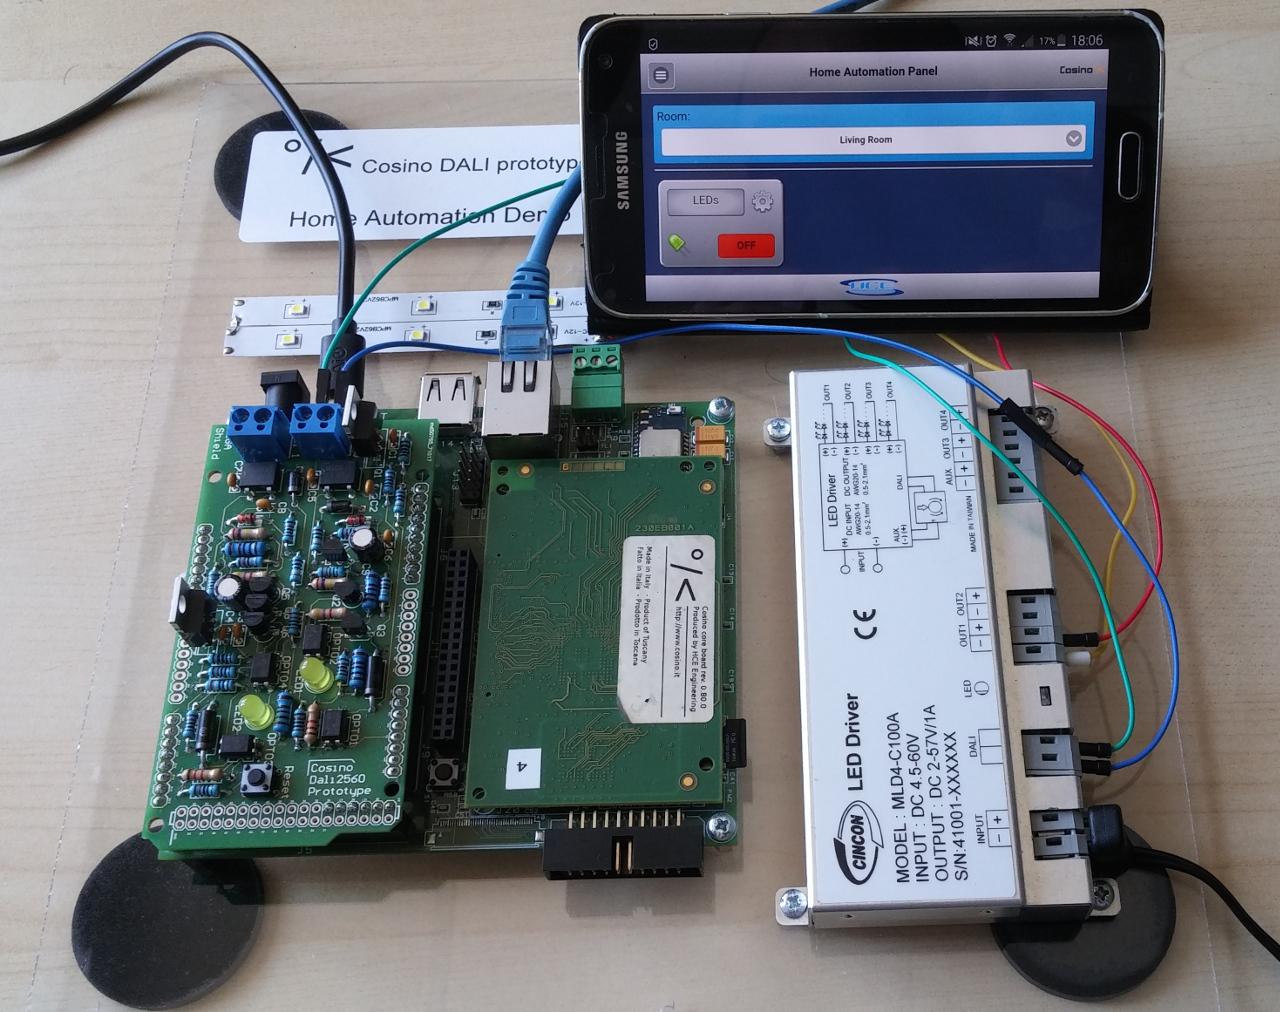 Cosino DALI Home Automation system